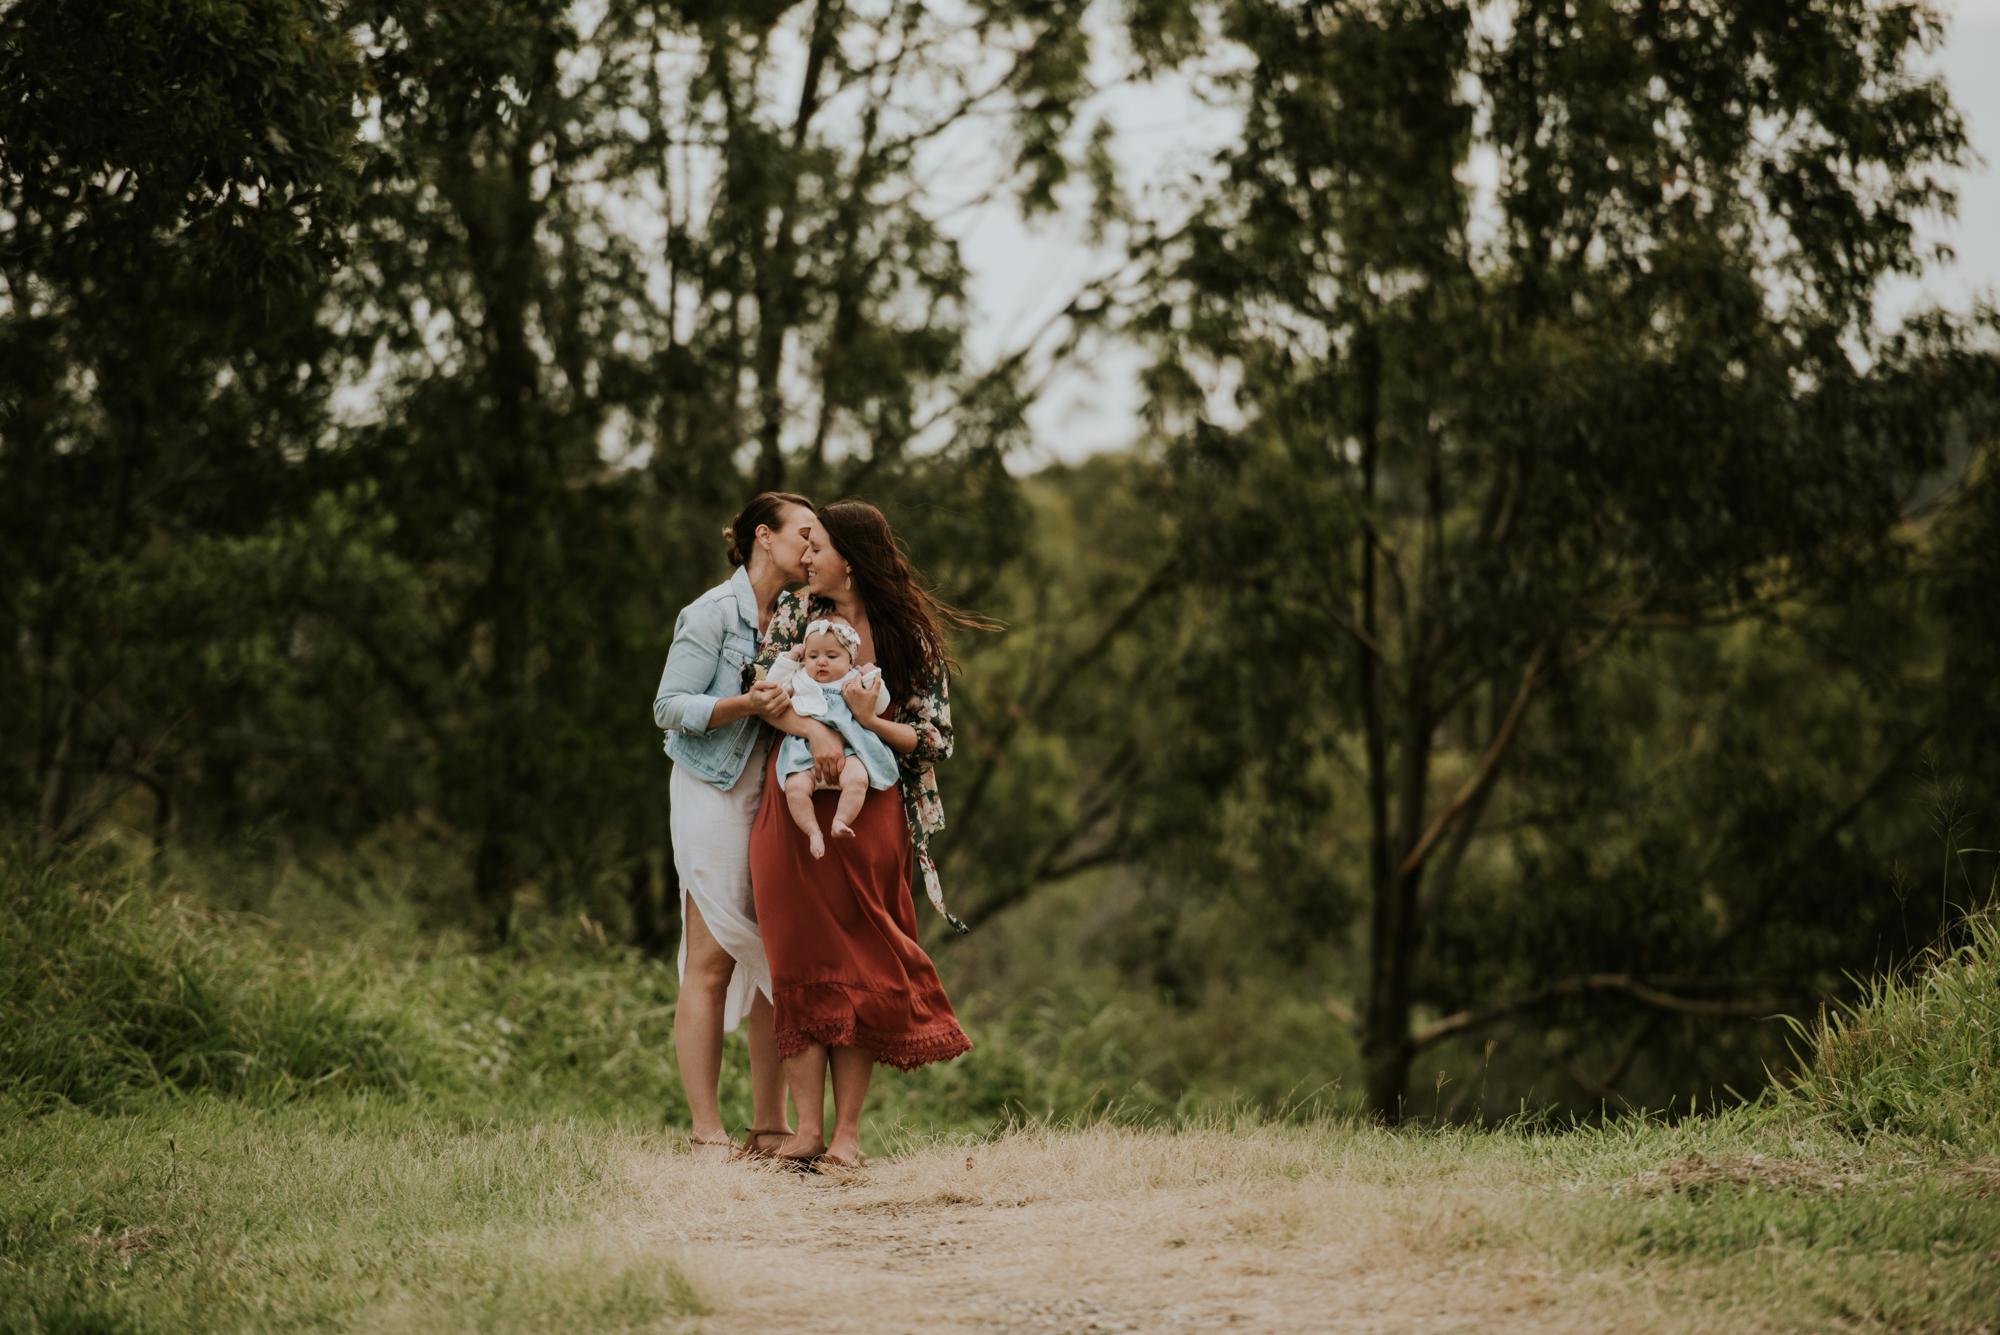 Brisbane Family Photographer | Newborn Photography-1.jpg